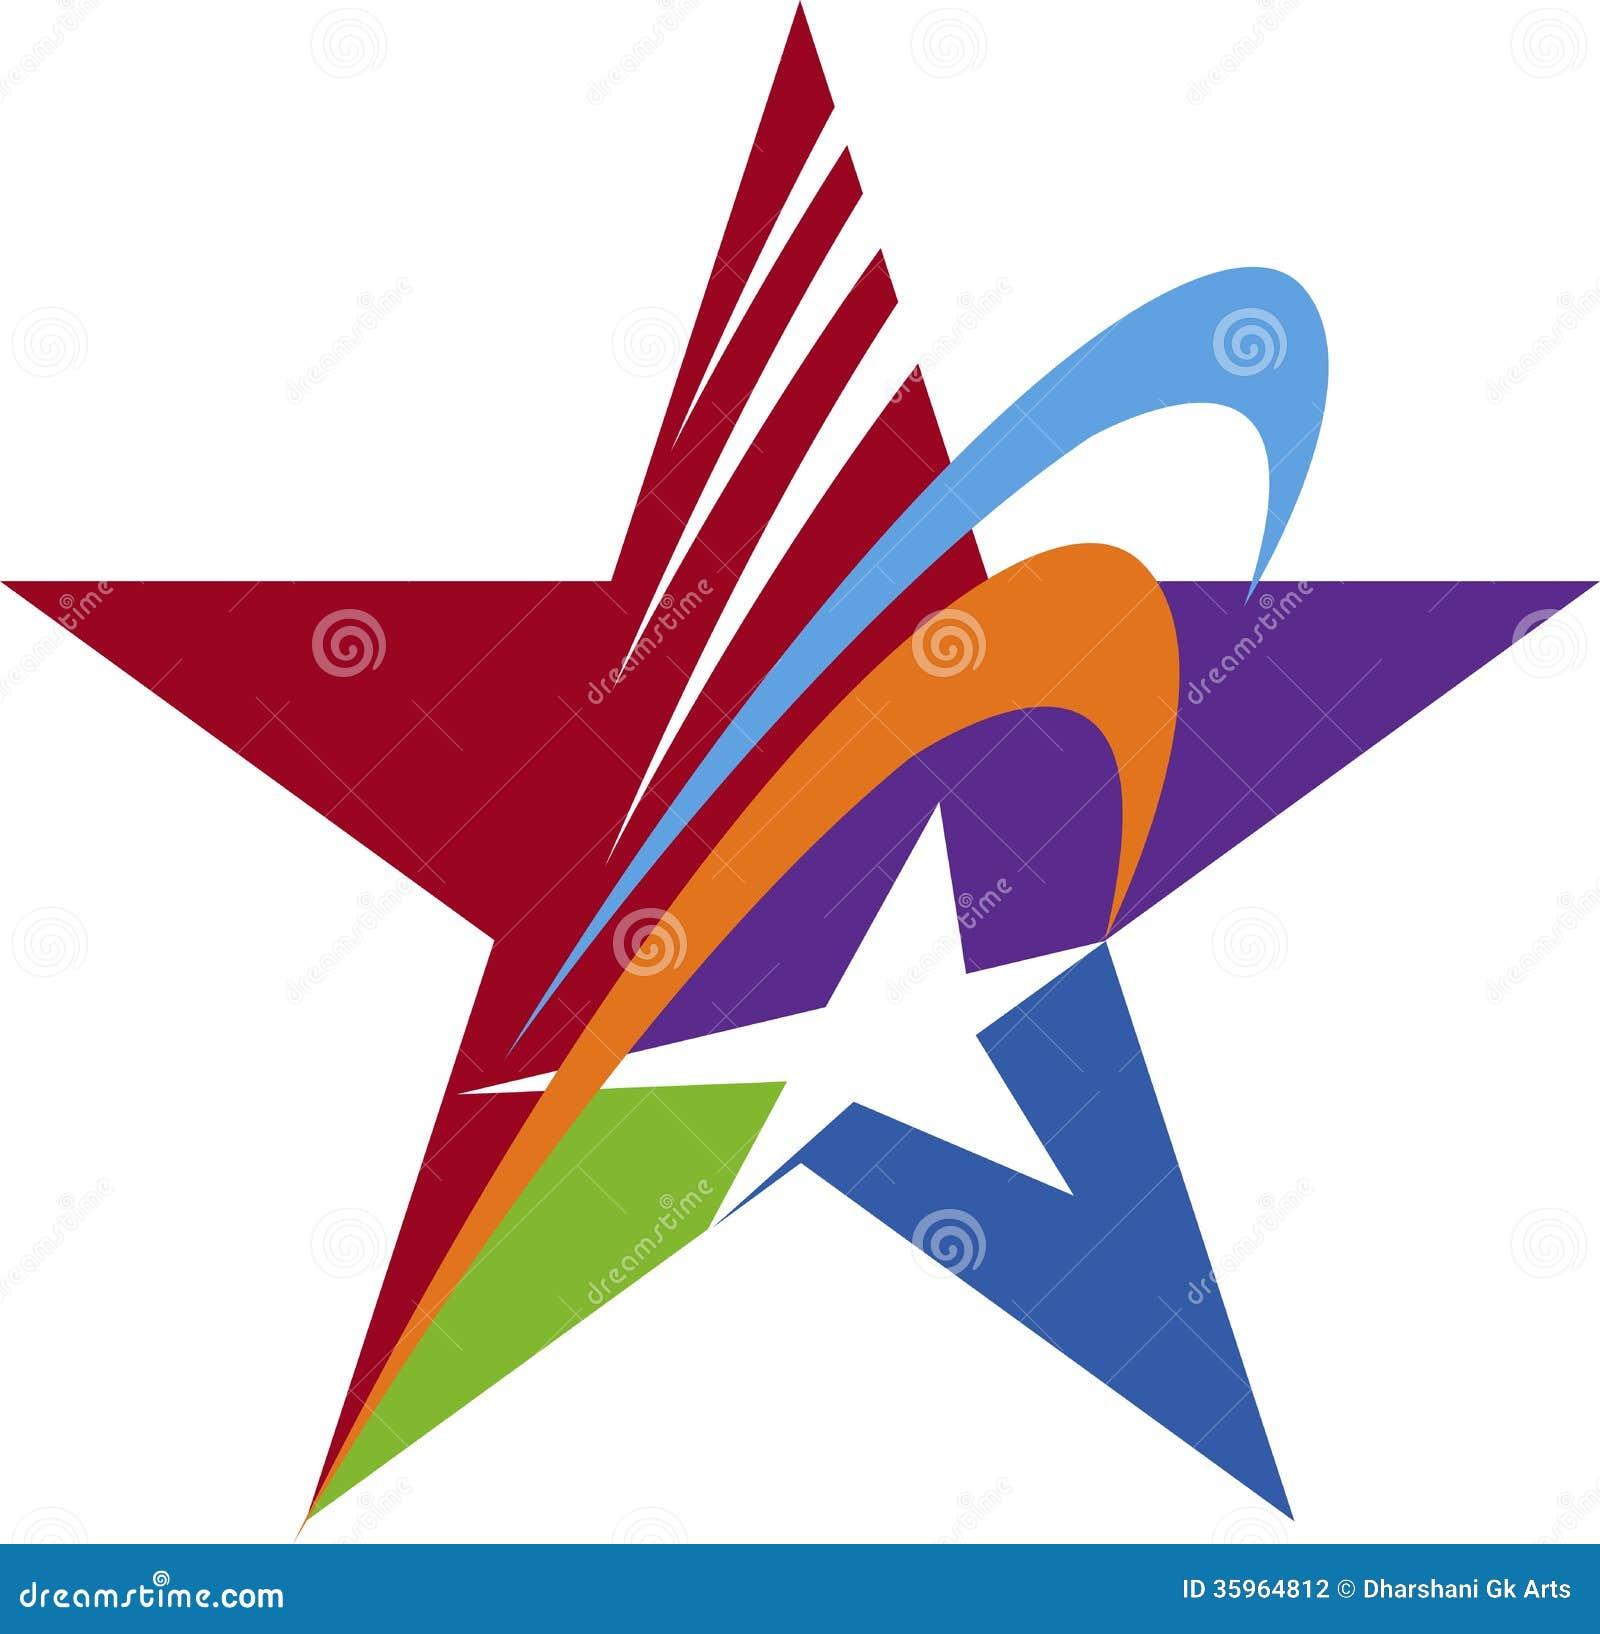 Star Logo Stock Vector - Image: 40658895